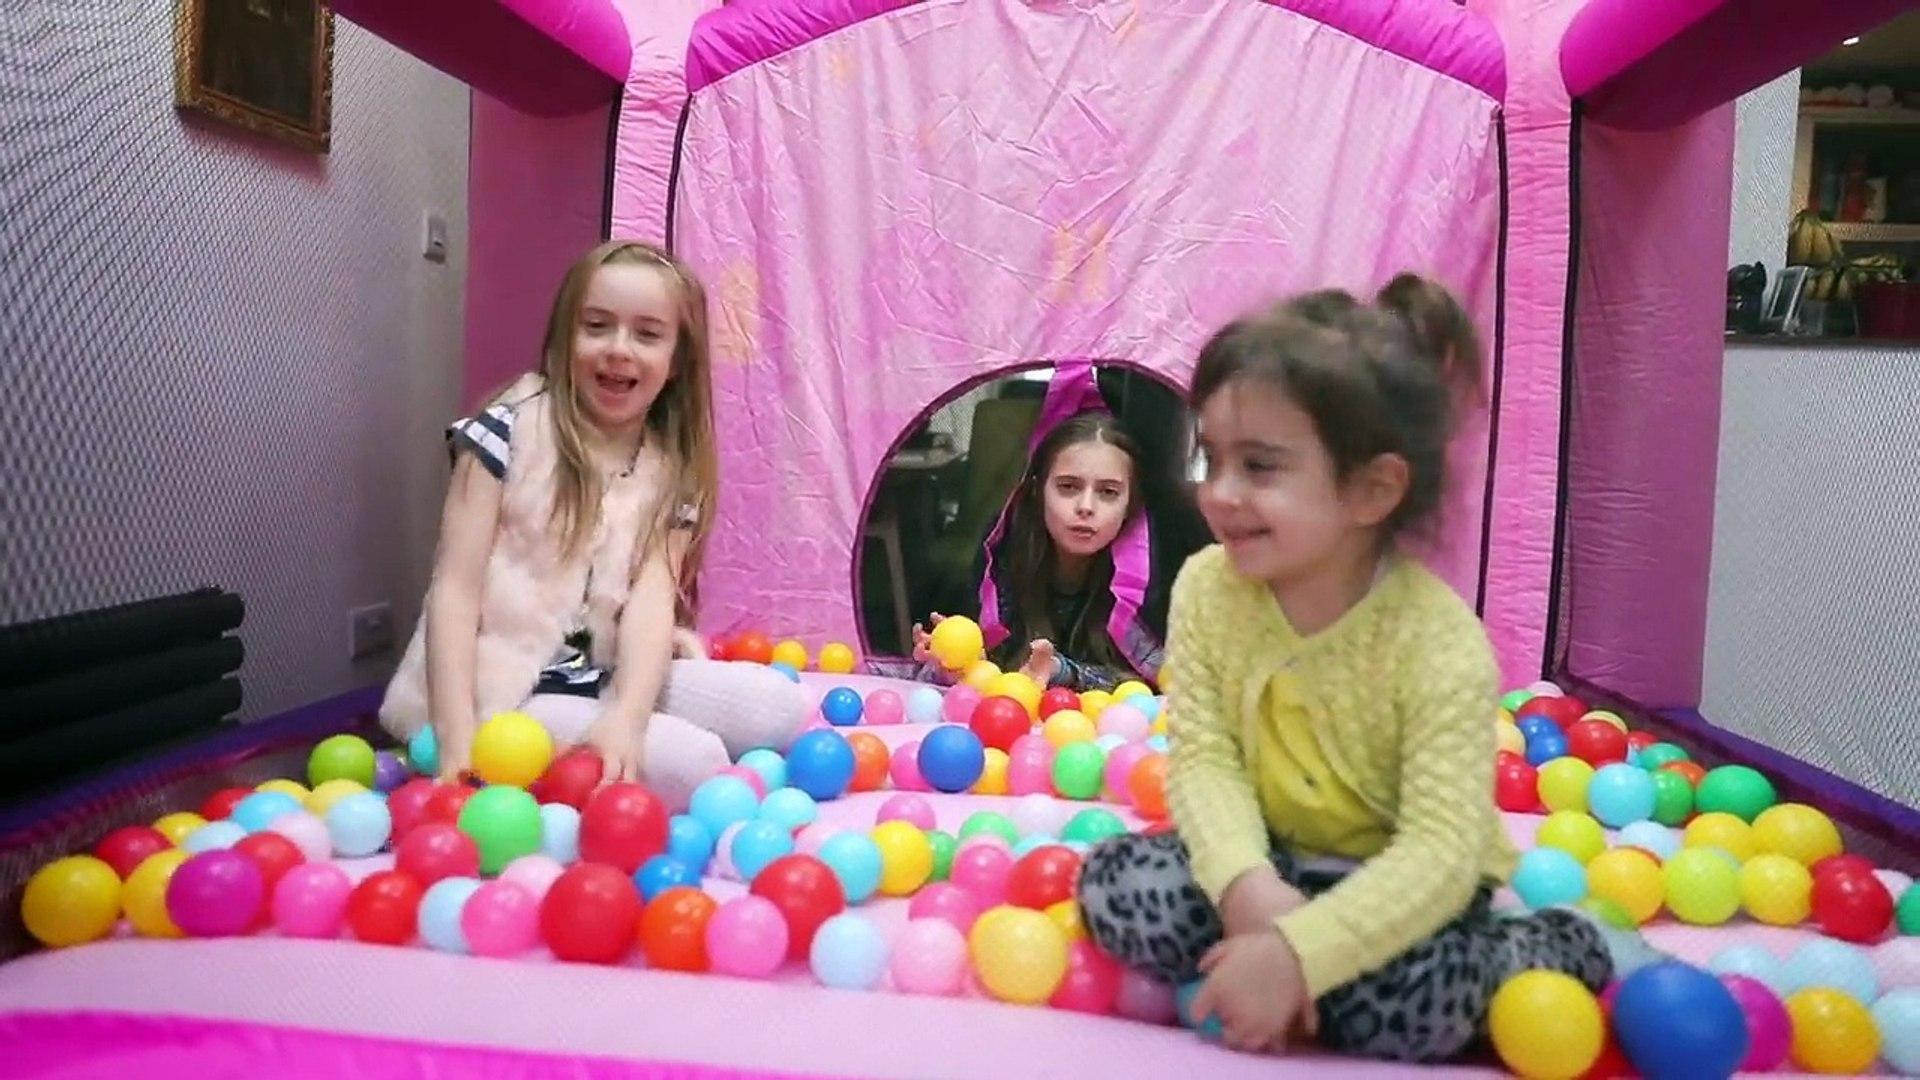 Magic Princess Bouncy Castle Fun Activities for Kids!